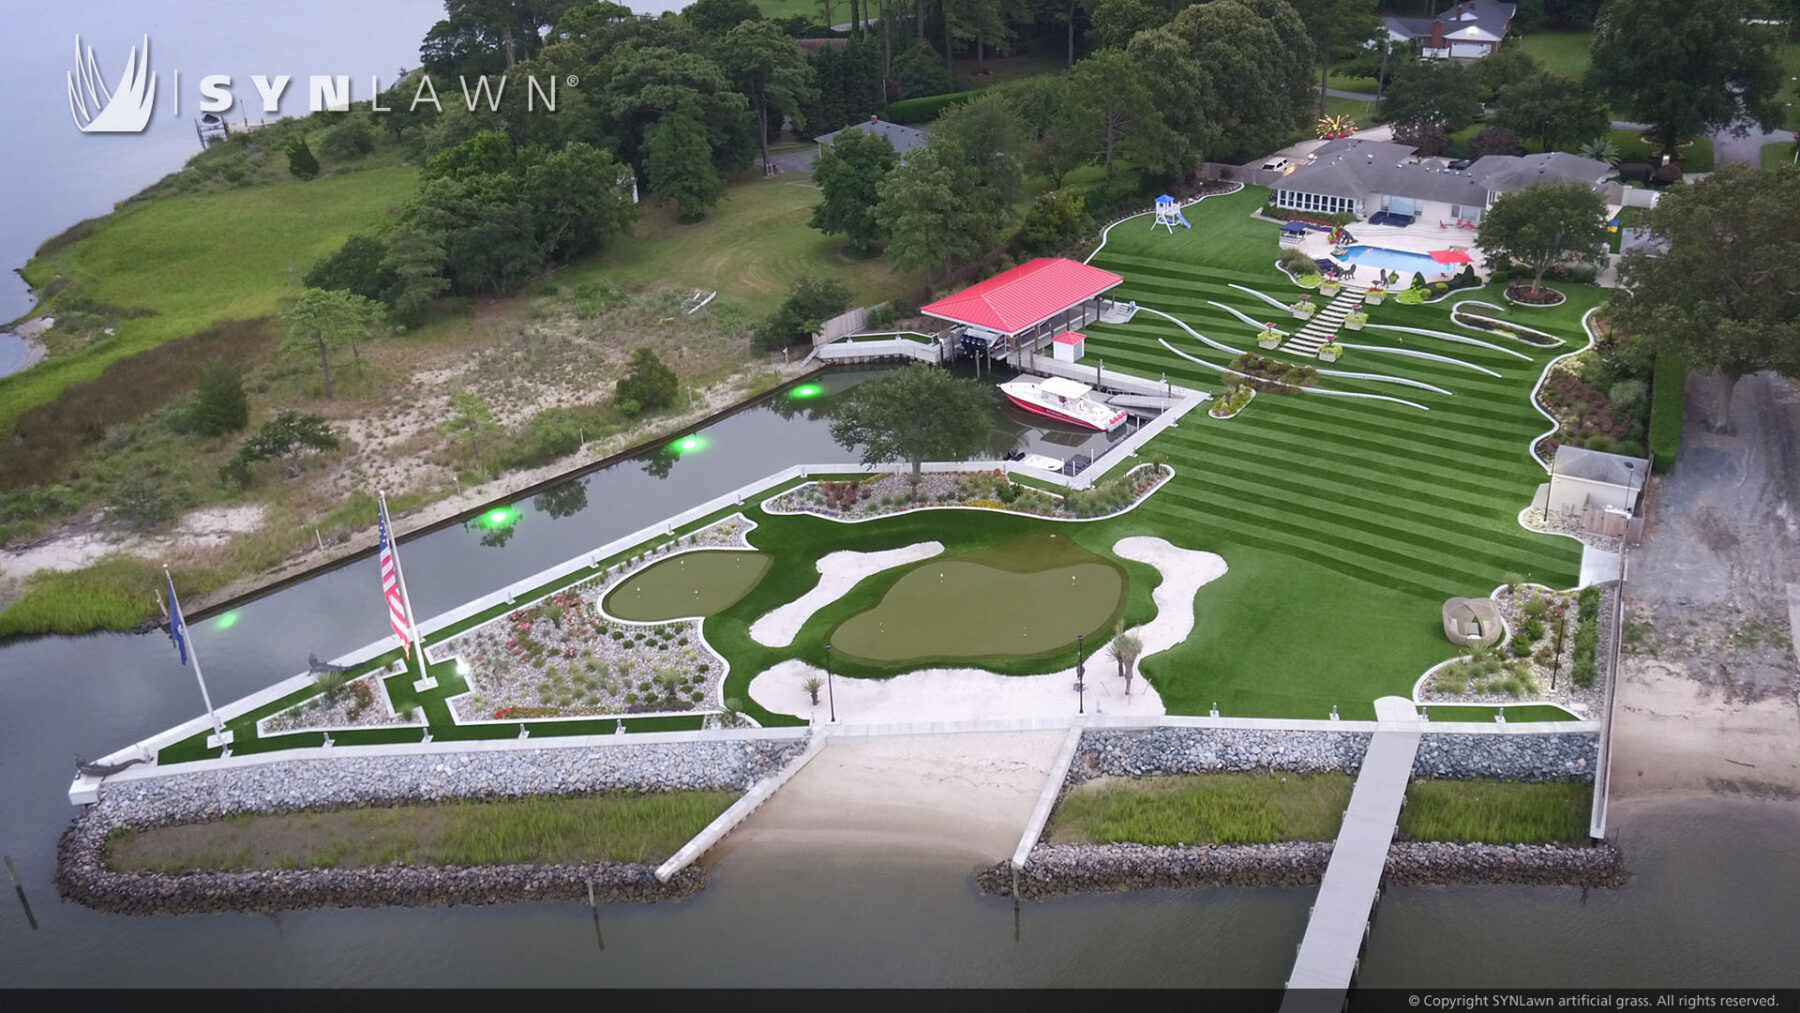 artificial grass, putting green and backyard turf installation